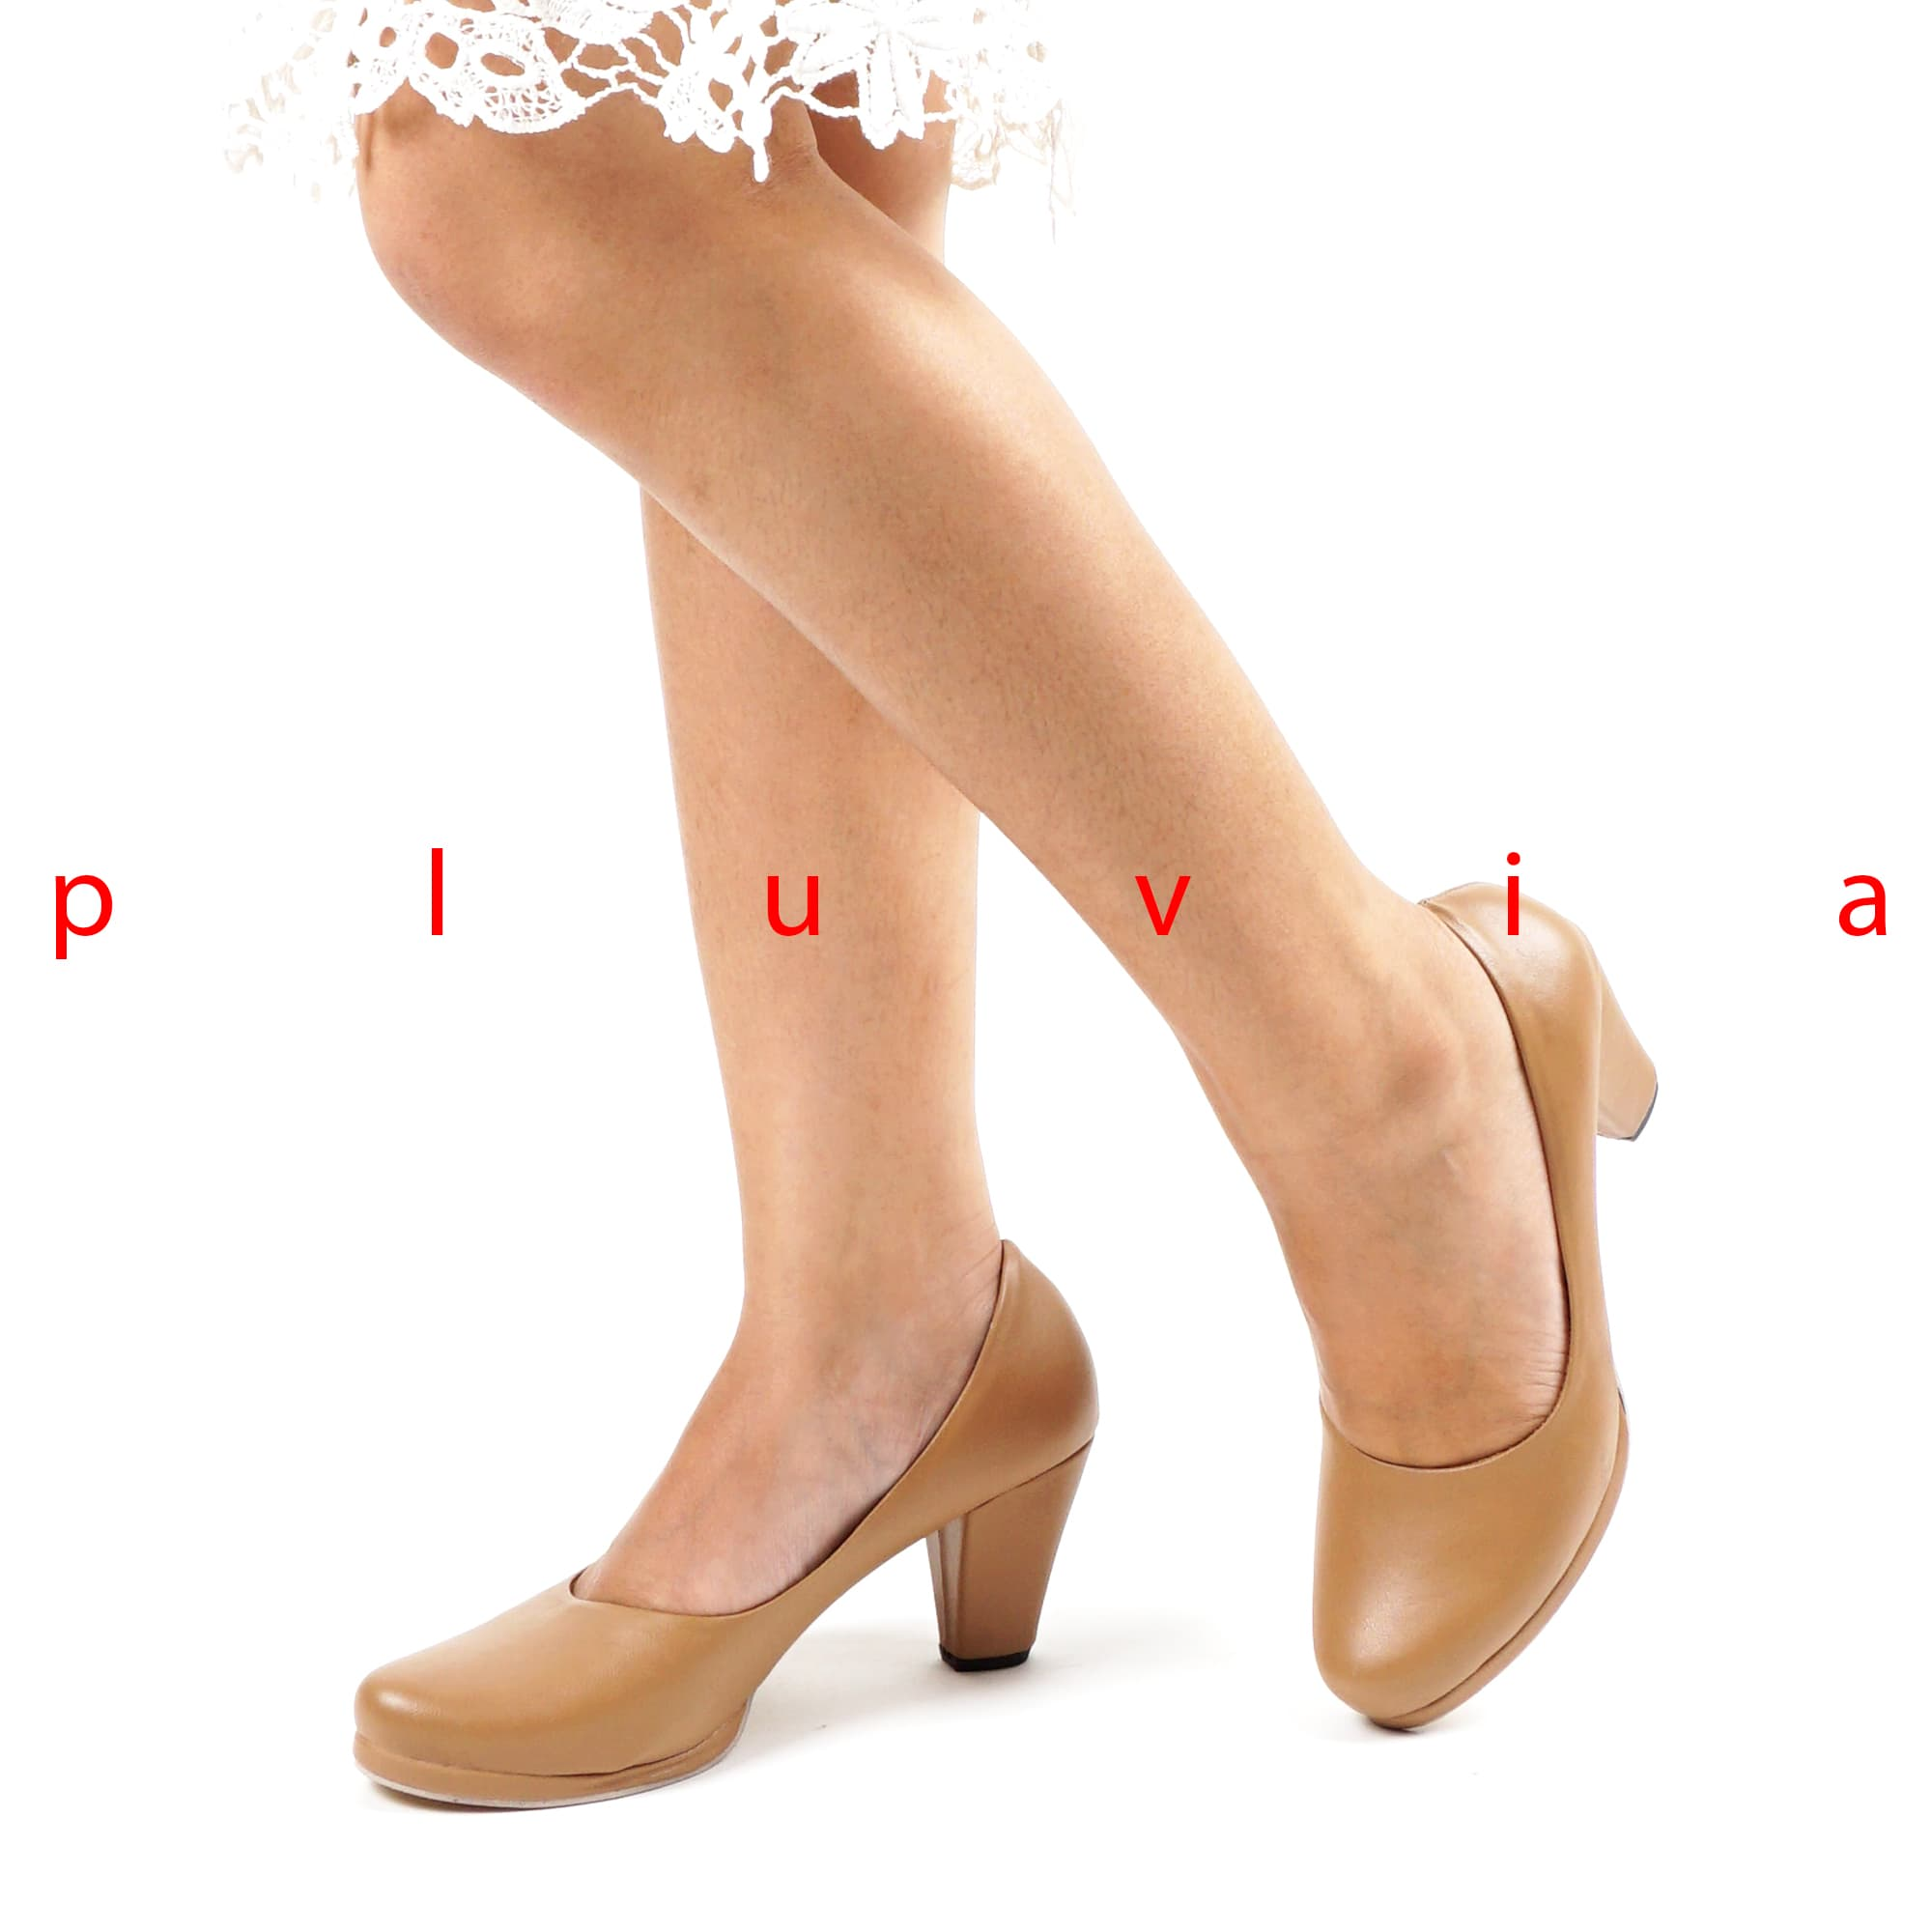 Jual Sepatu Pantofel Wanita Block Heels SD01 Moka - Cokelat Muda, 37 - Pluvia Shoes